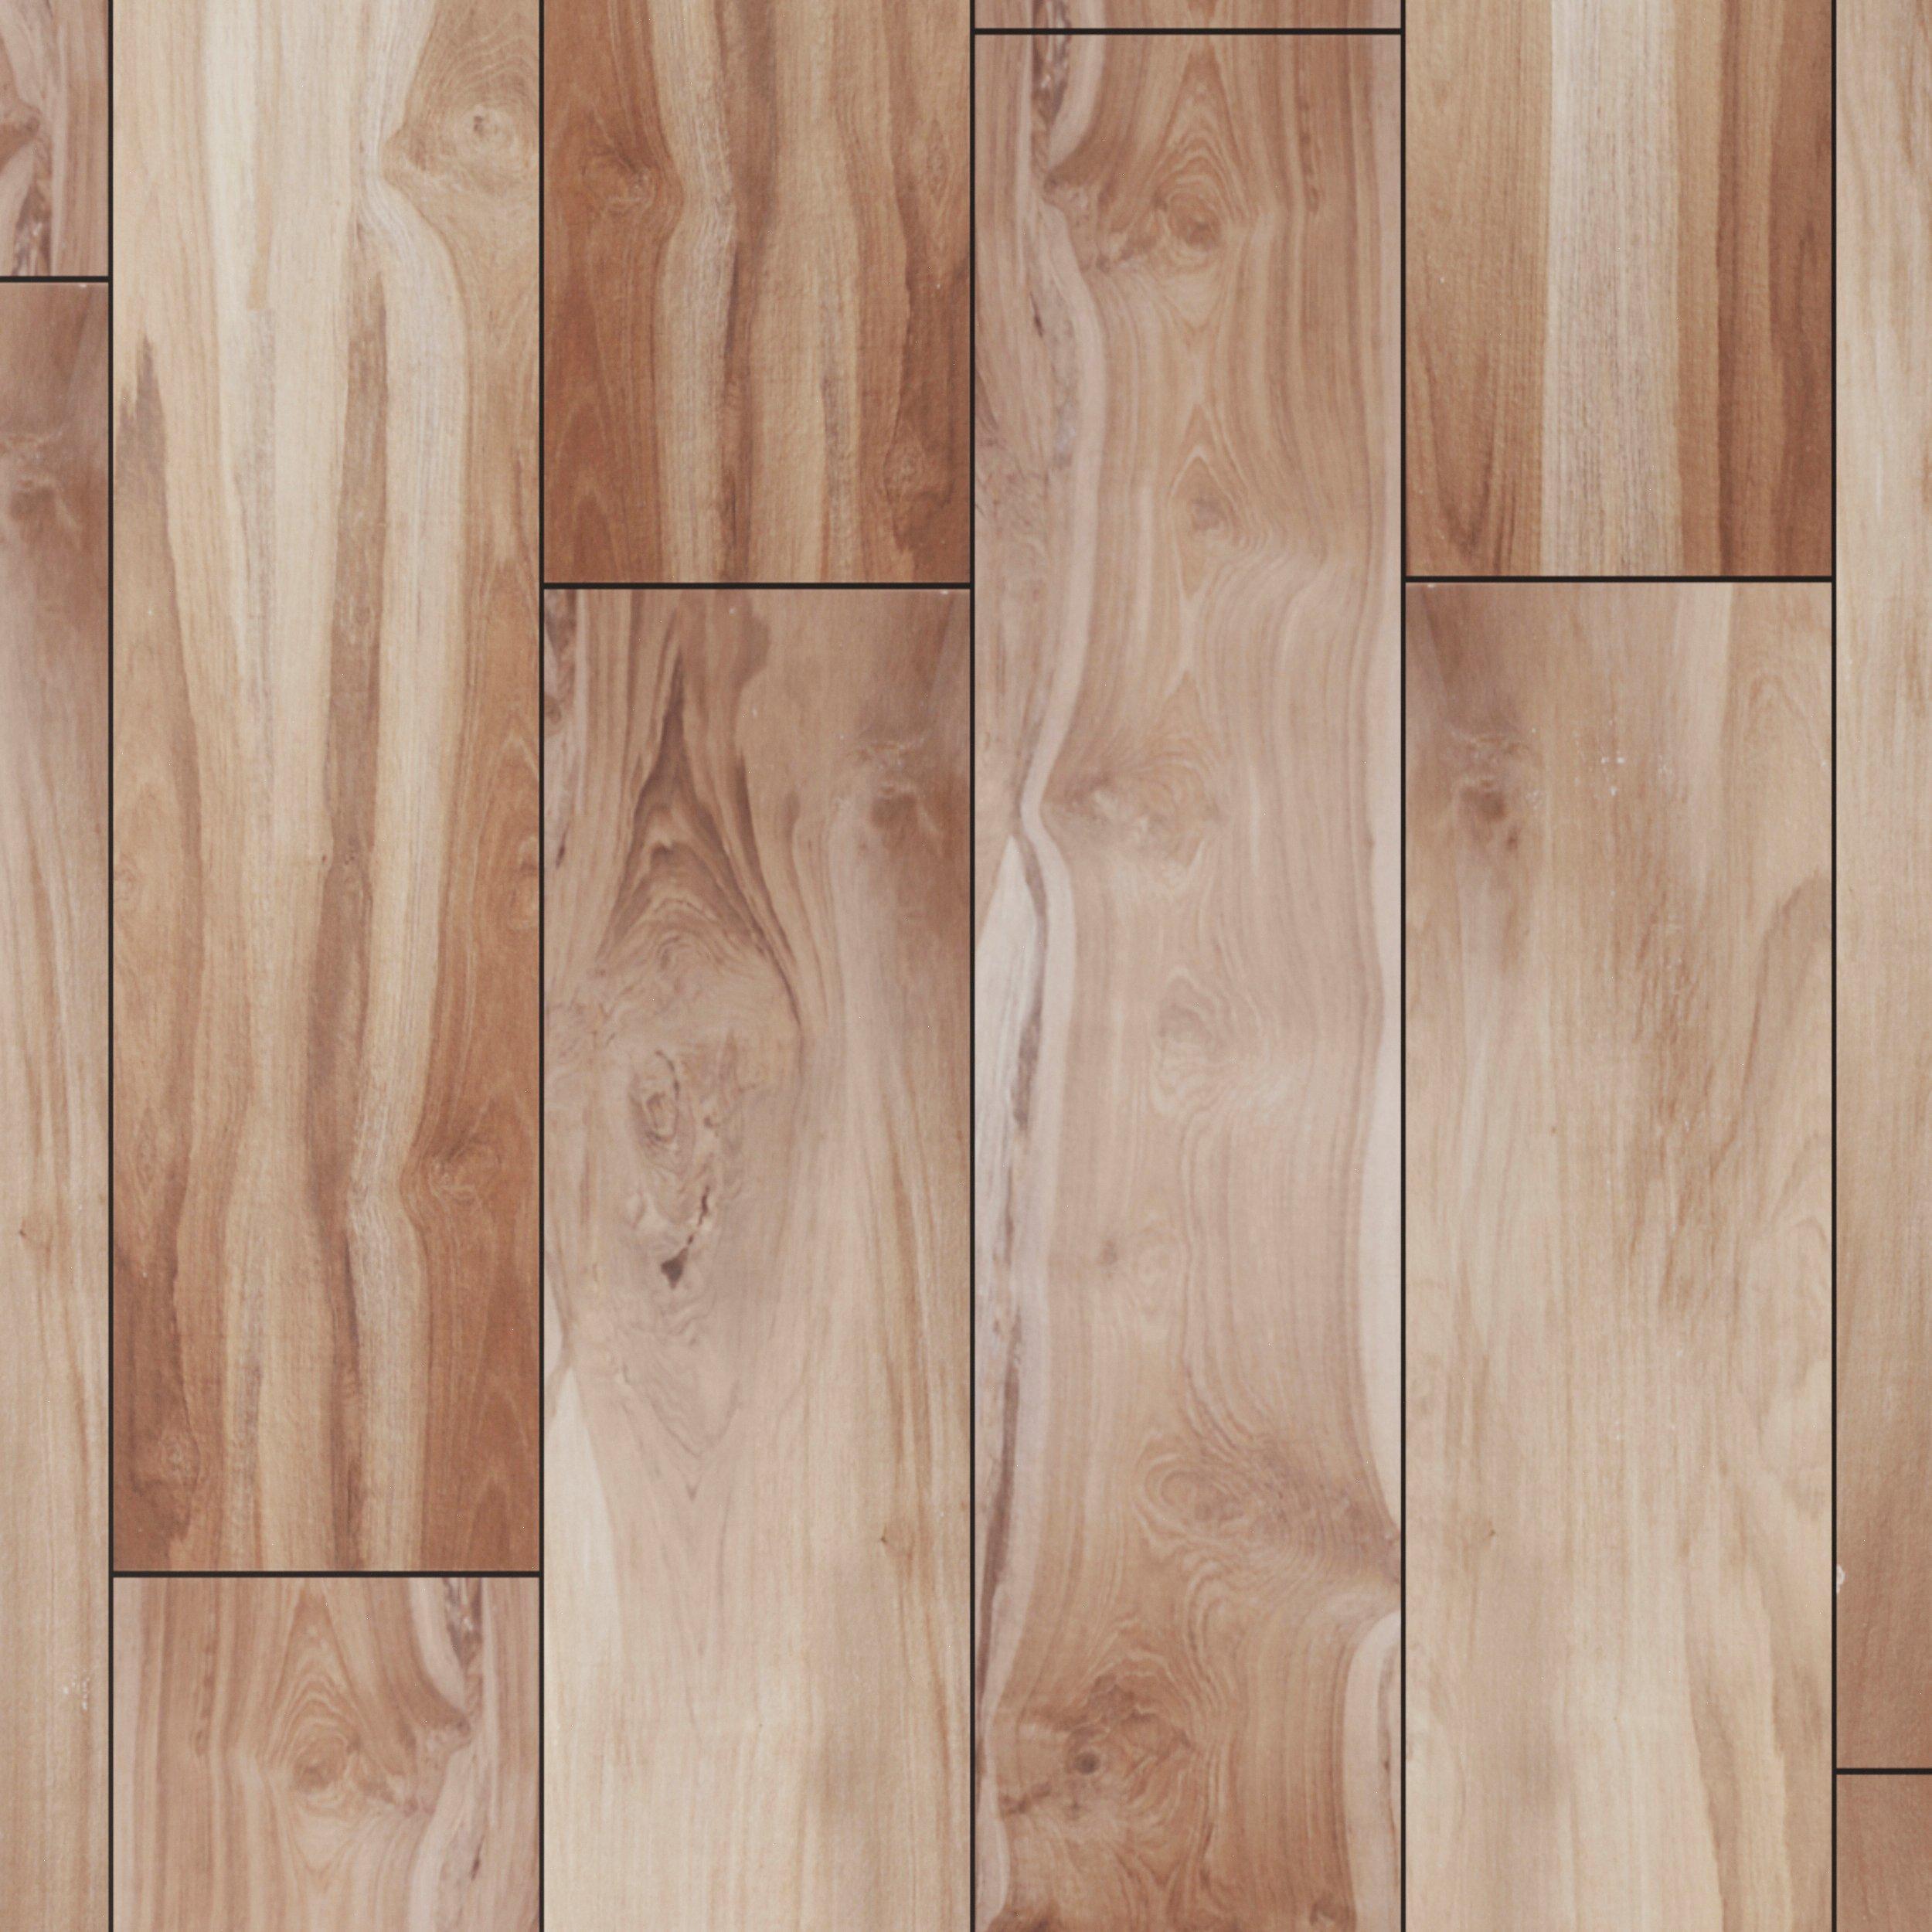 Winchester Oak Wood Plank Porcelain Tile, Winchester Oak Wood Plank Laminate Flooring